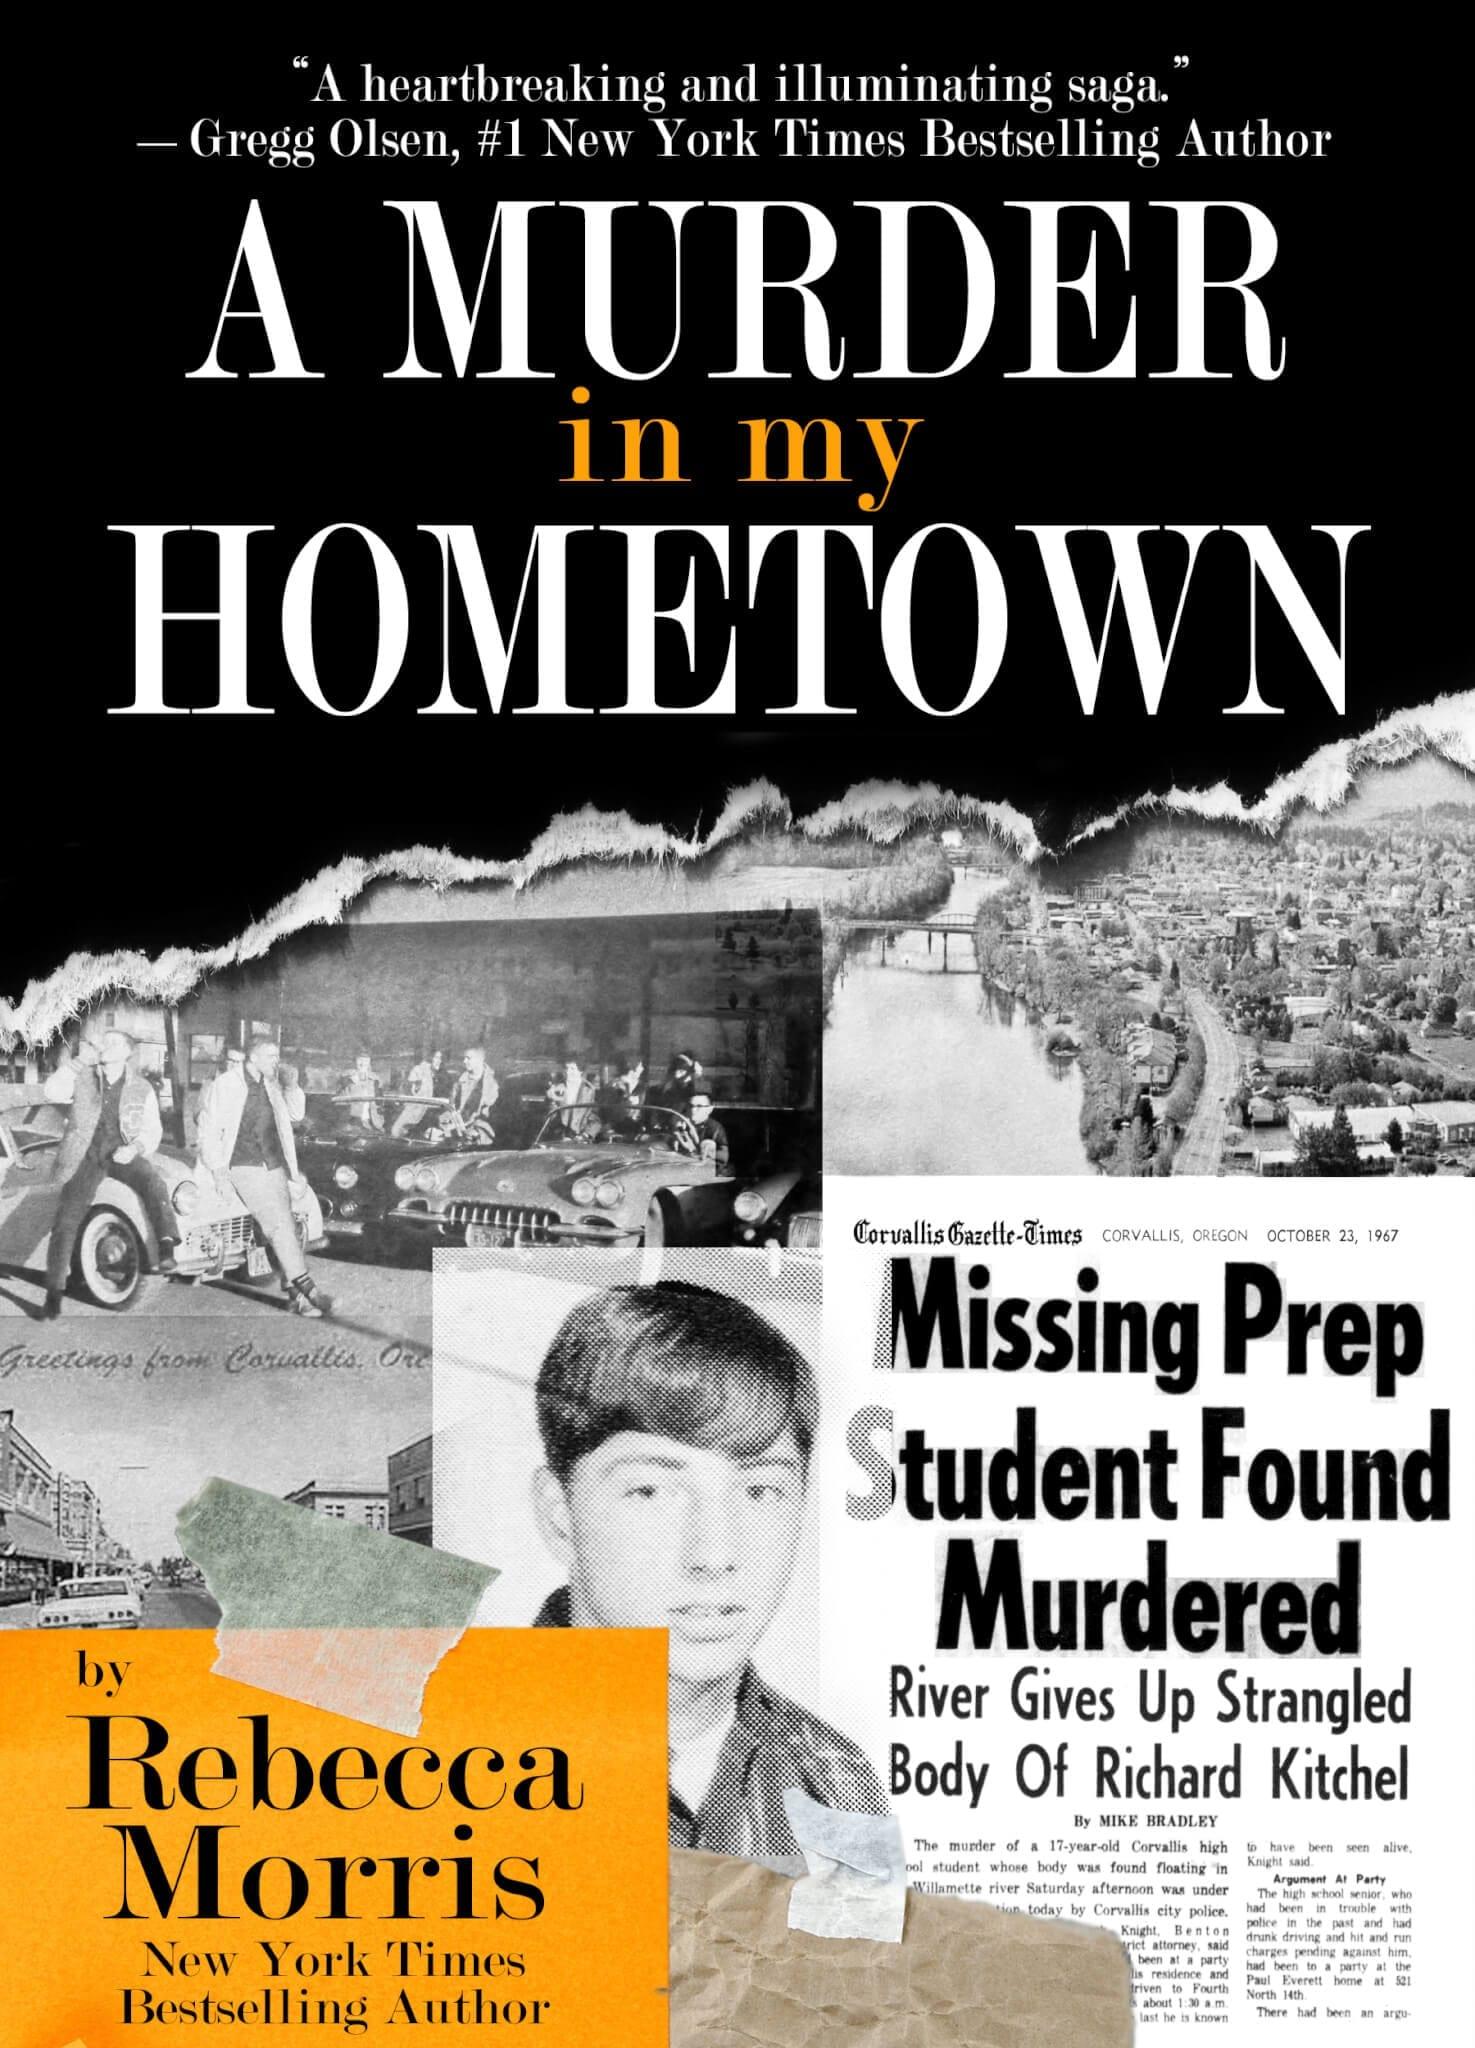 A Murder in My Hometown by Rebecca Morris